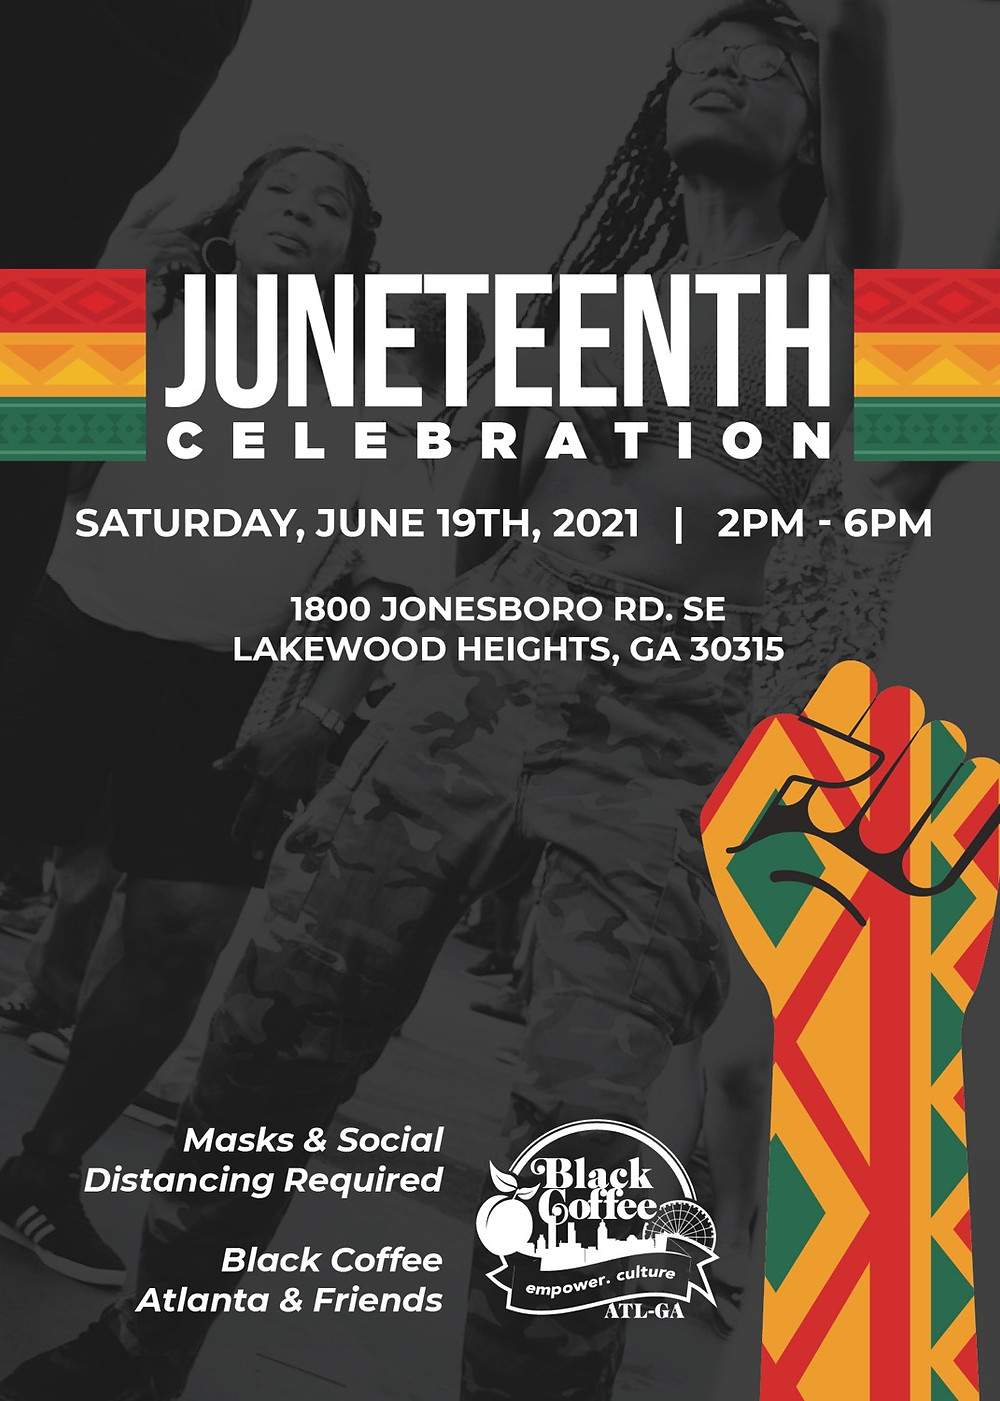 Flyer promoting our JUNETEENTH dedication celebration for Black Coffee Atlanta